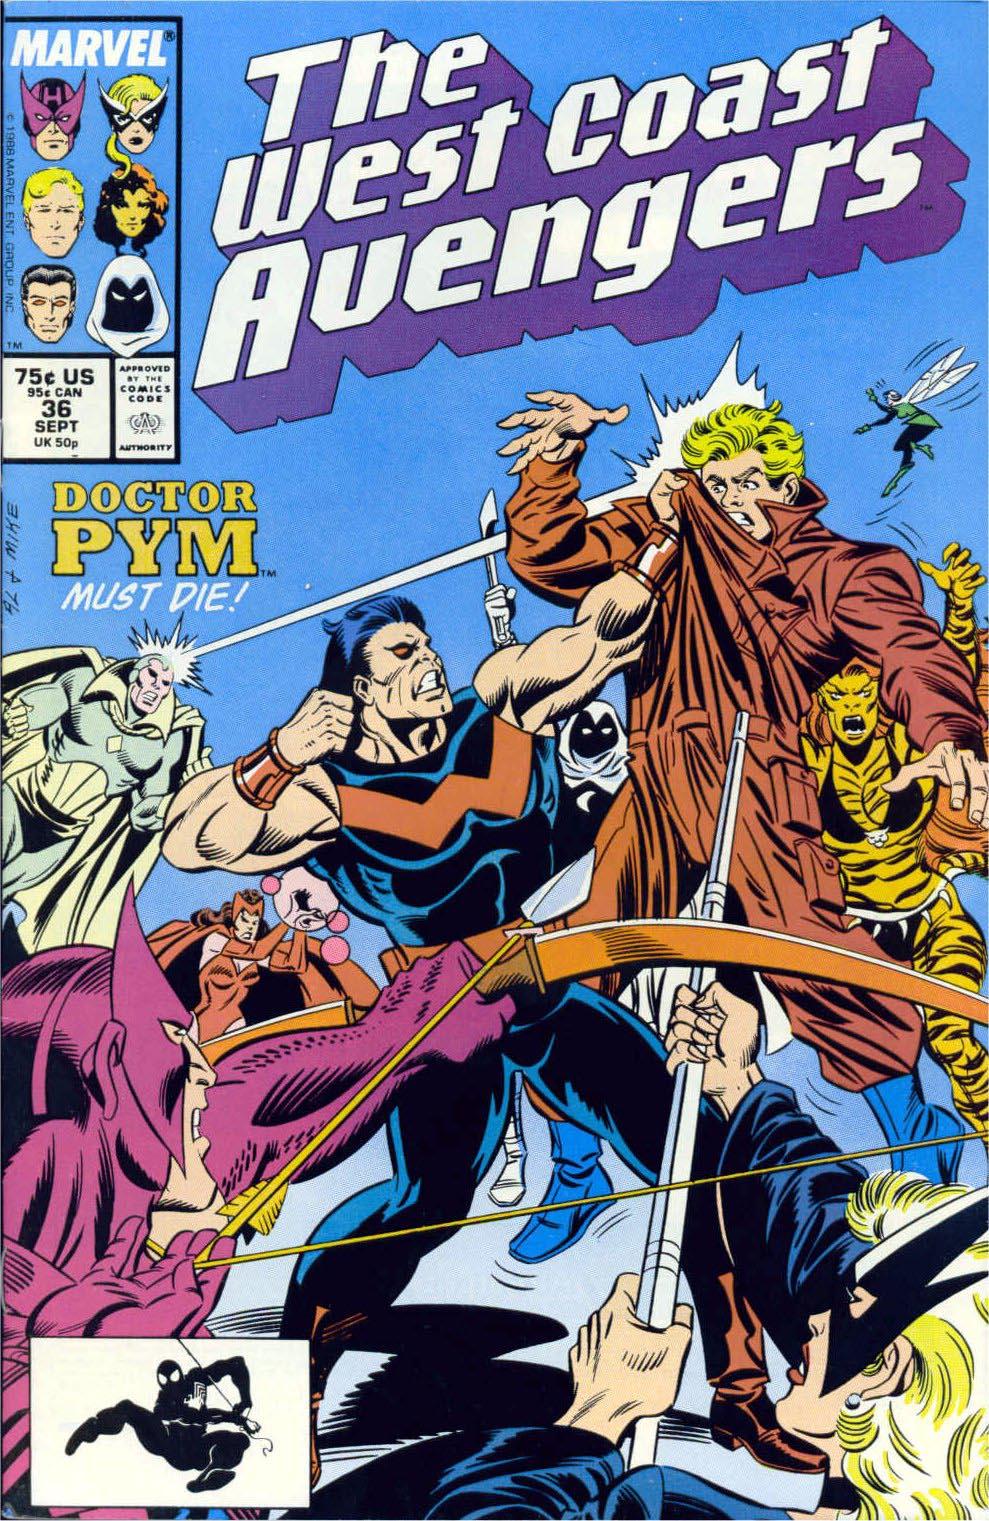 West Coast Avengers (1985) 36 Page 1